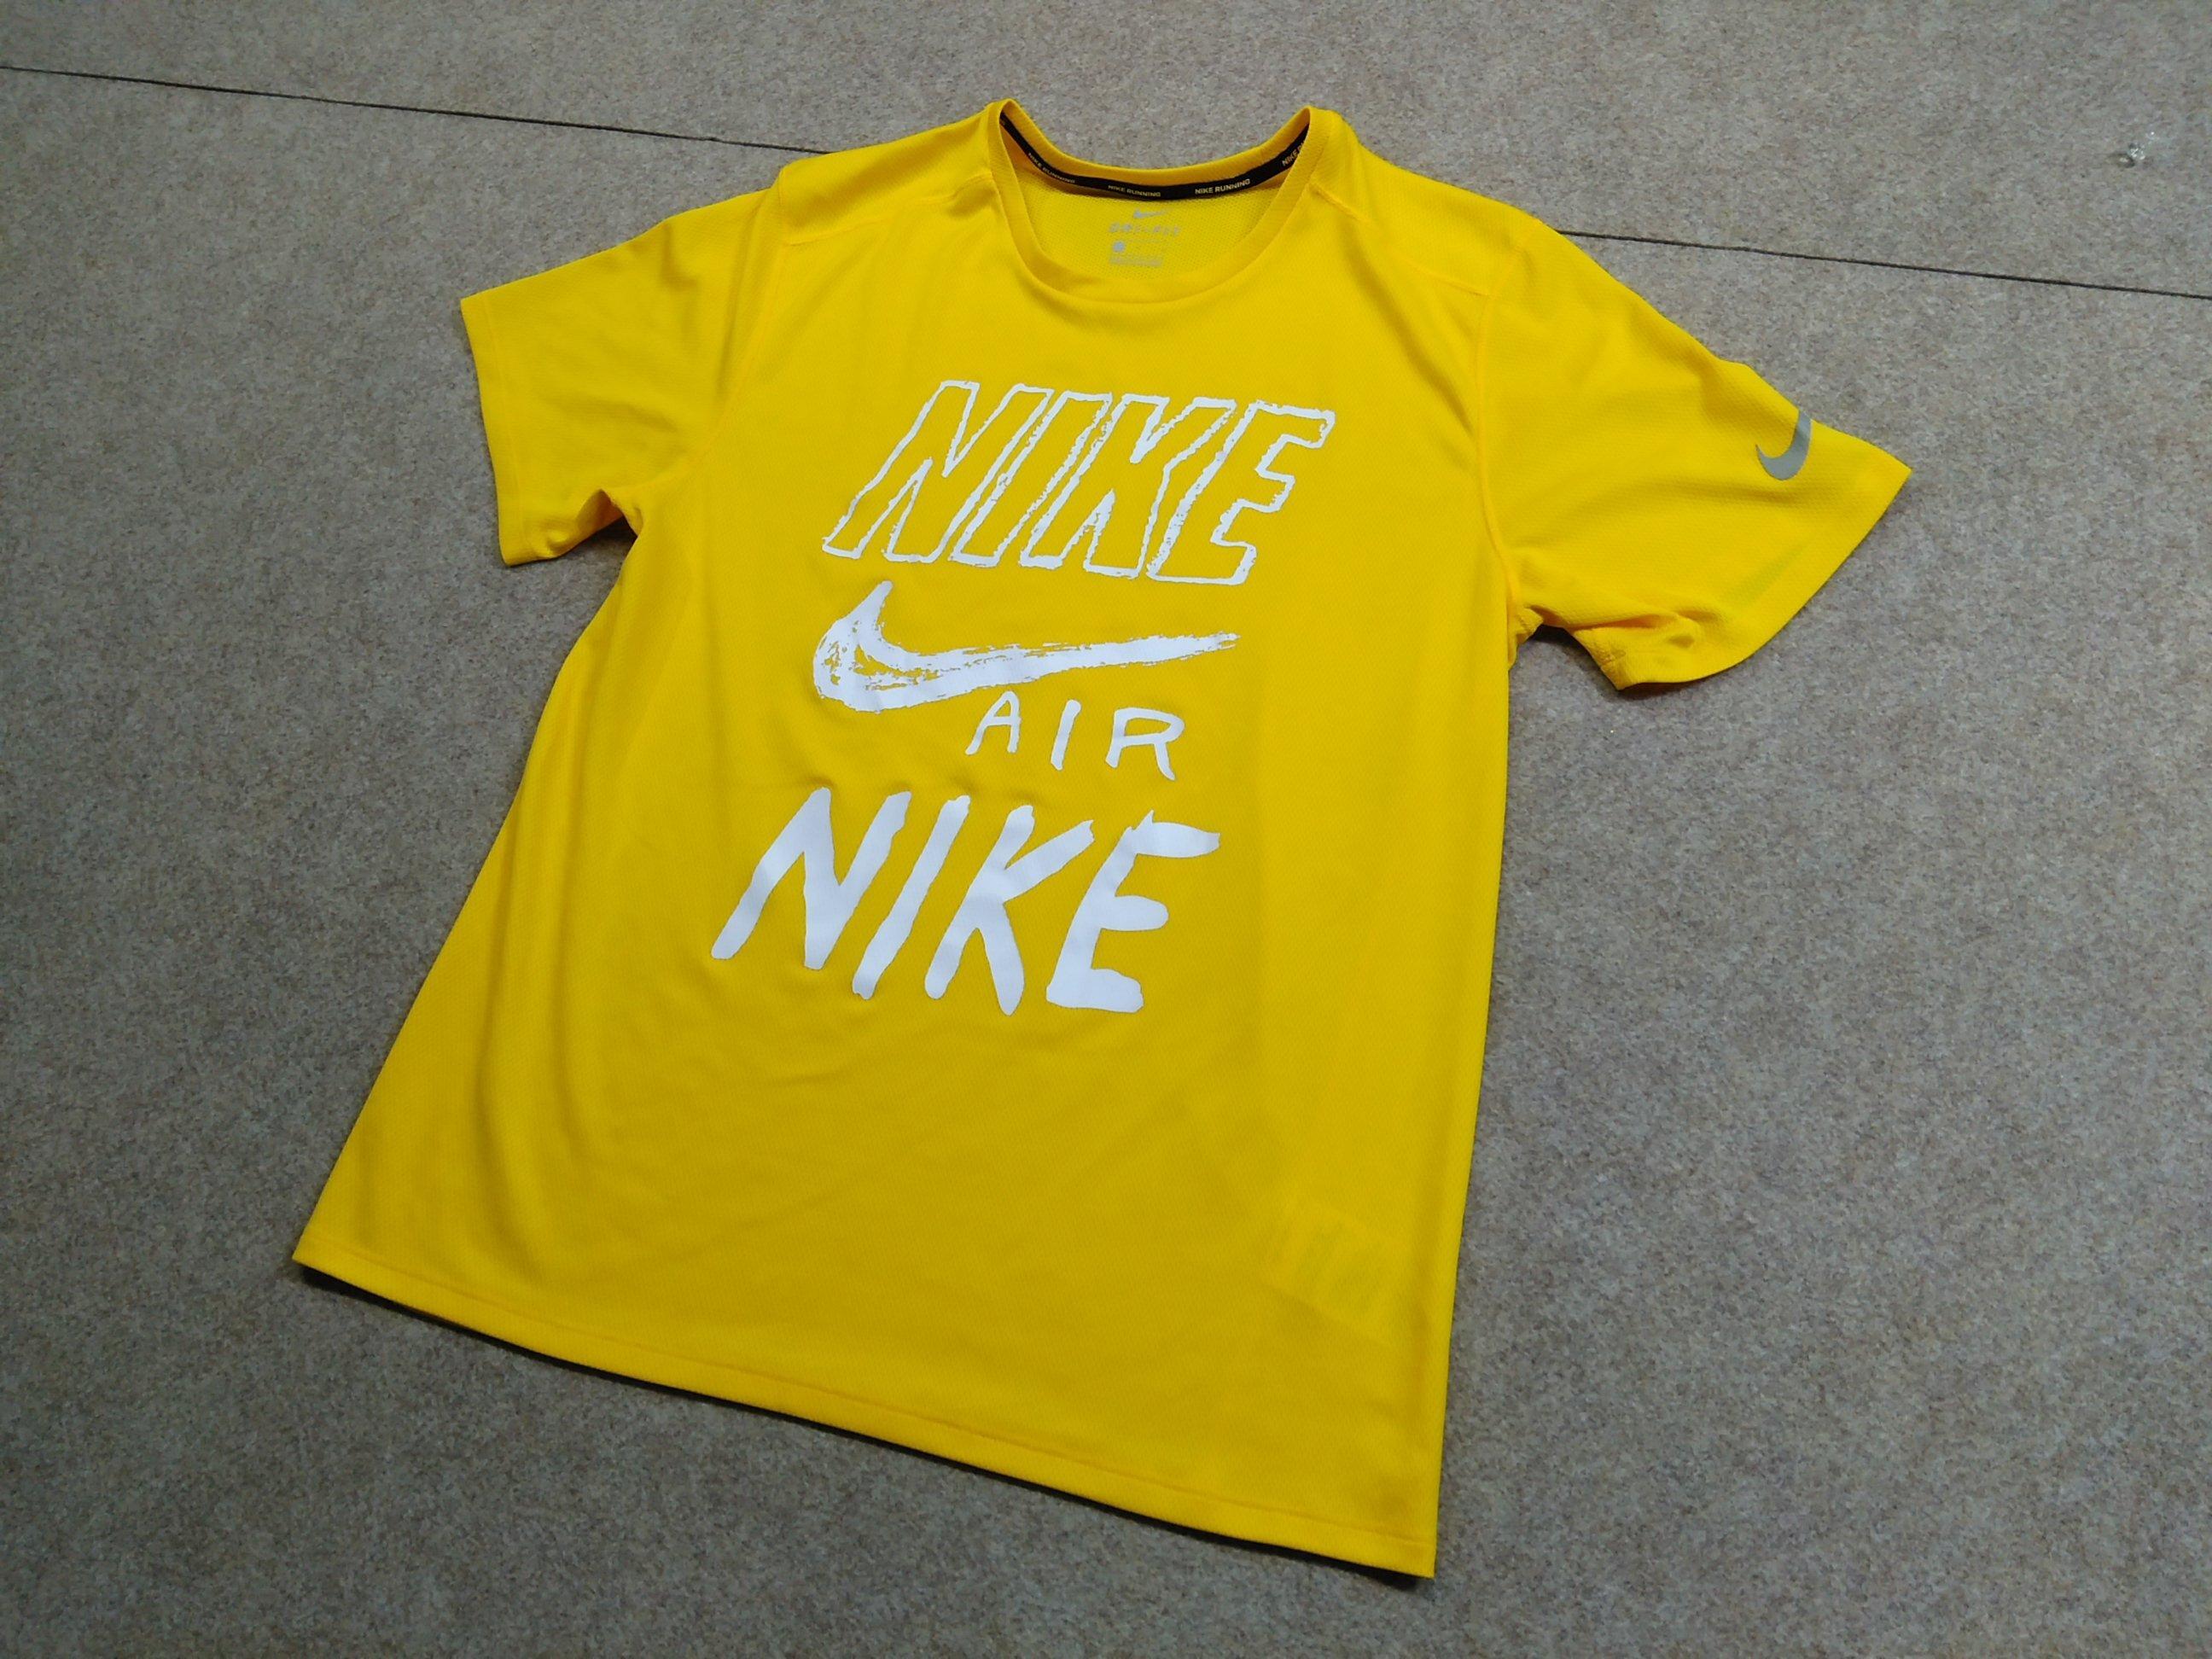 NIKE ナイキ Tシャツ L 黄色 DRI-FIT my457s